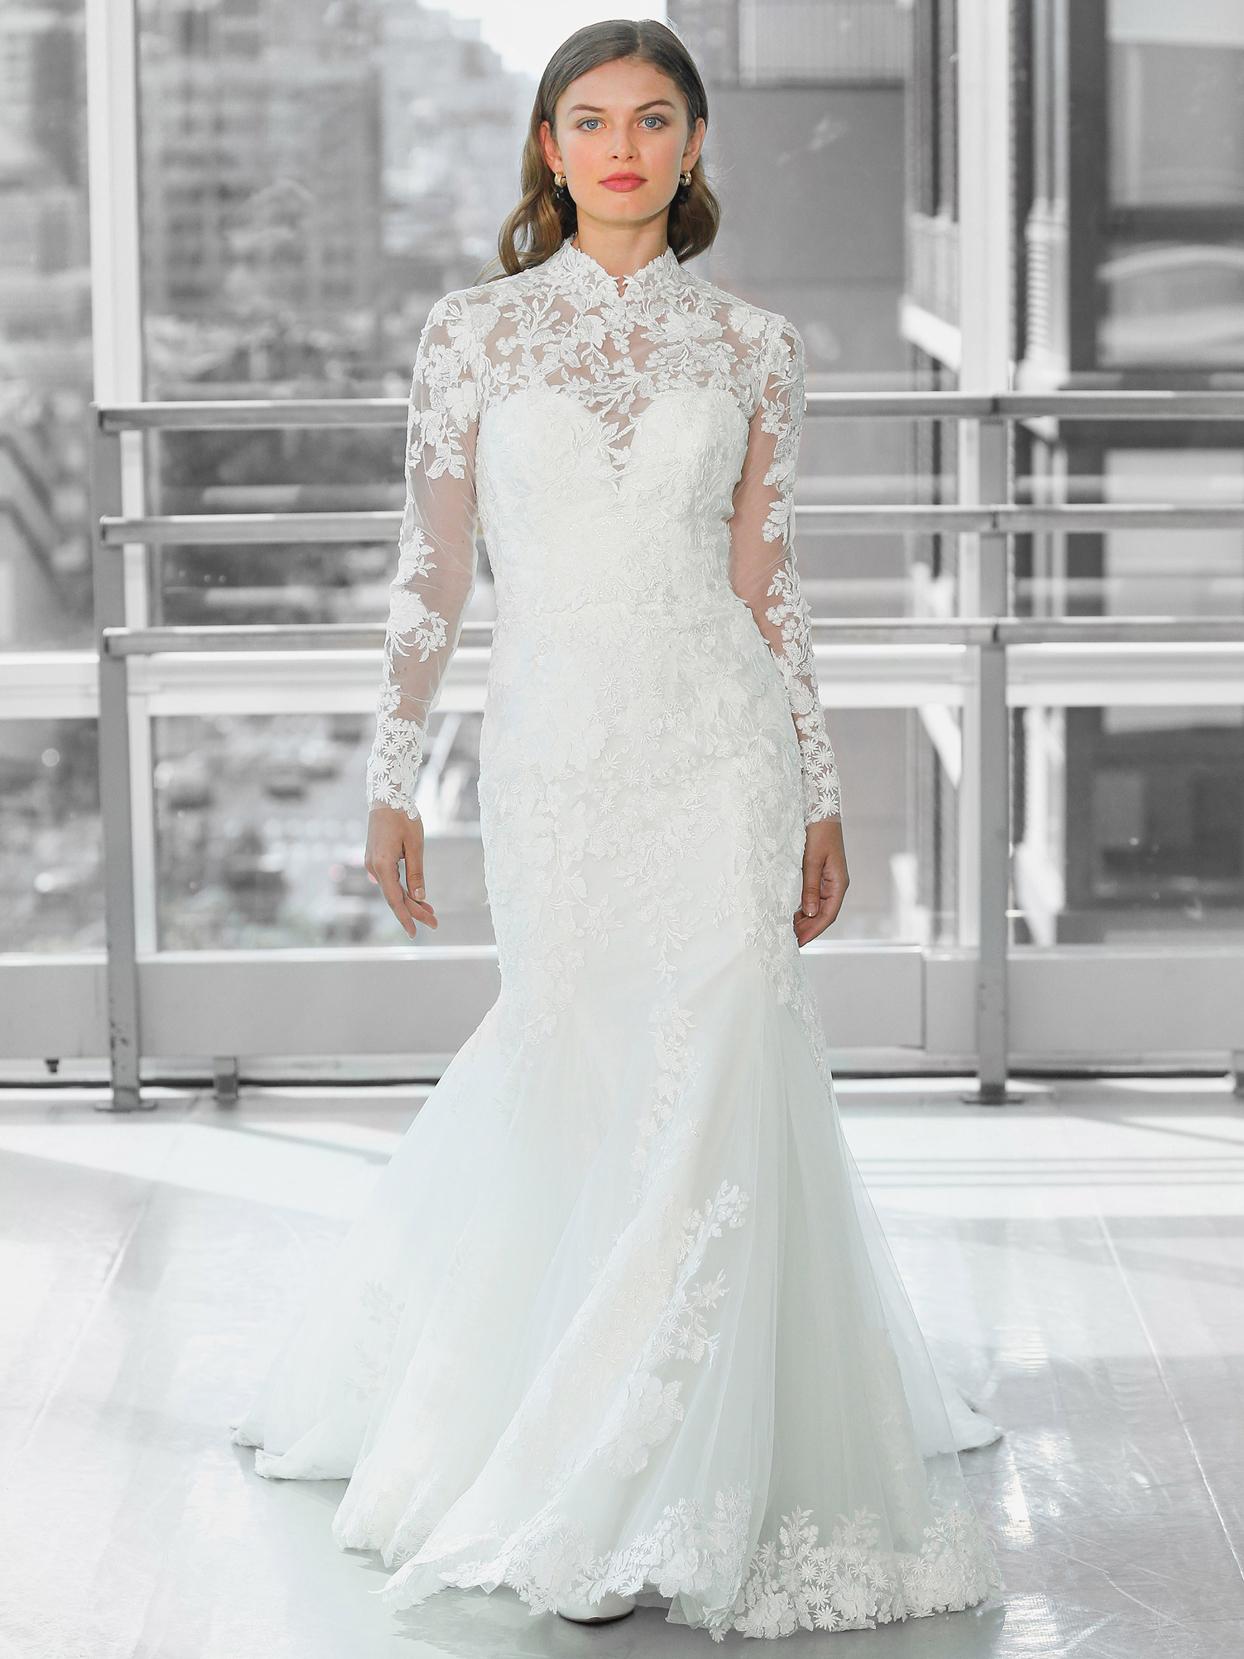 Justin Alexander Signature lace long sleeve illusion high neck mermaid wedding dress fall 2020